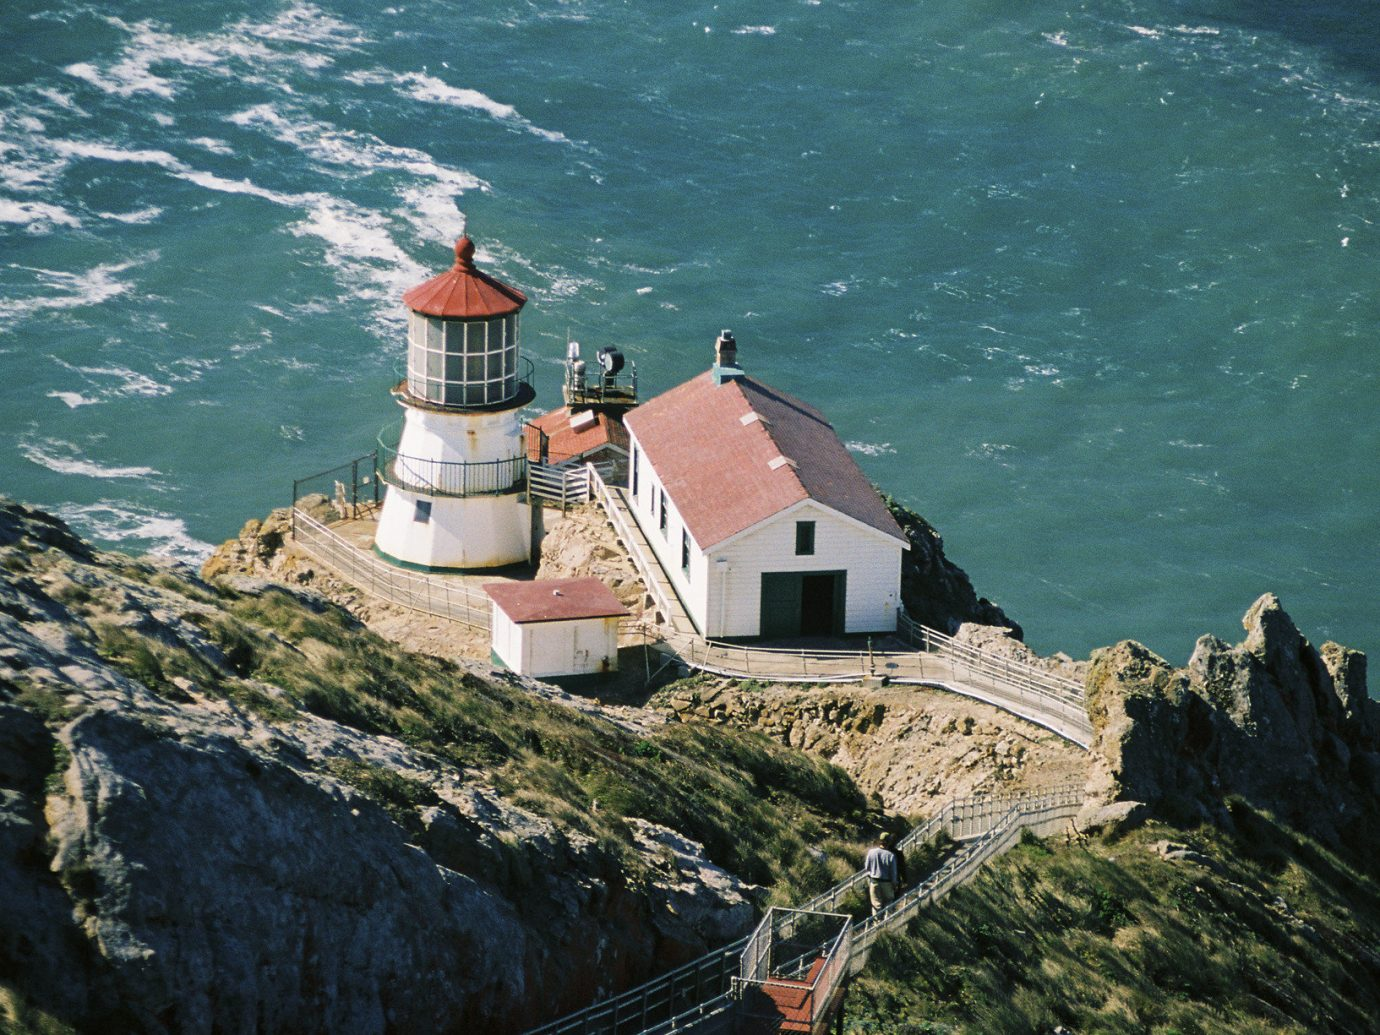 Trip Ideas rock mountain outdoor tower lighthouse Sea Coast Ocean rocky cape cliff terrain aerial photography stone hillside